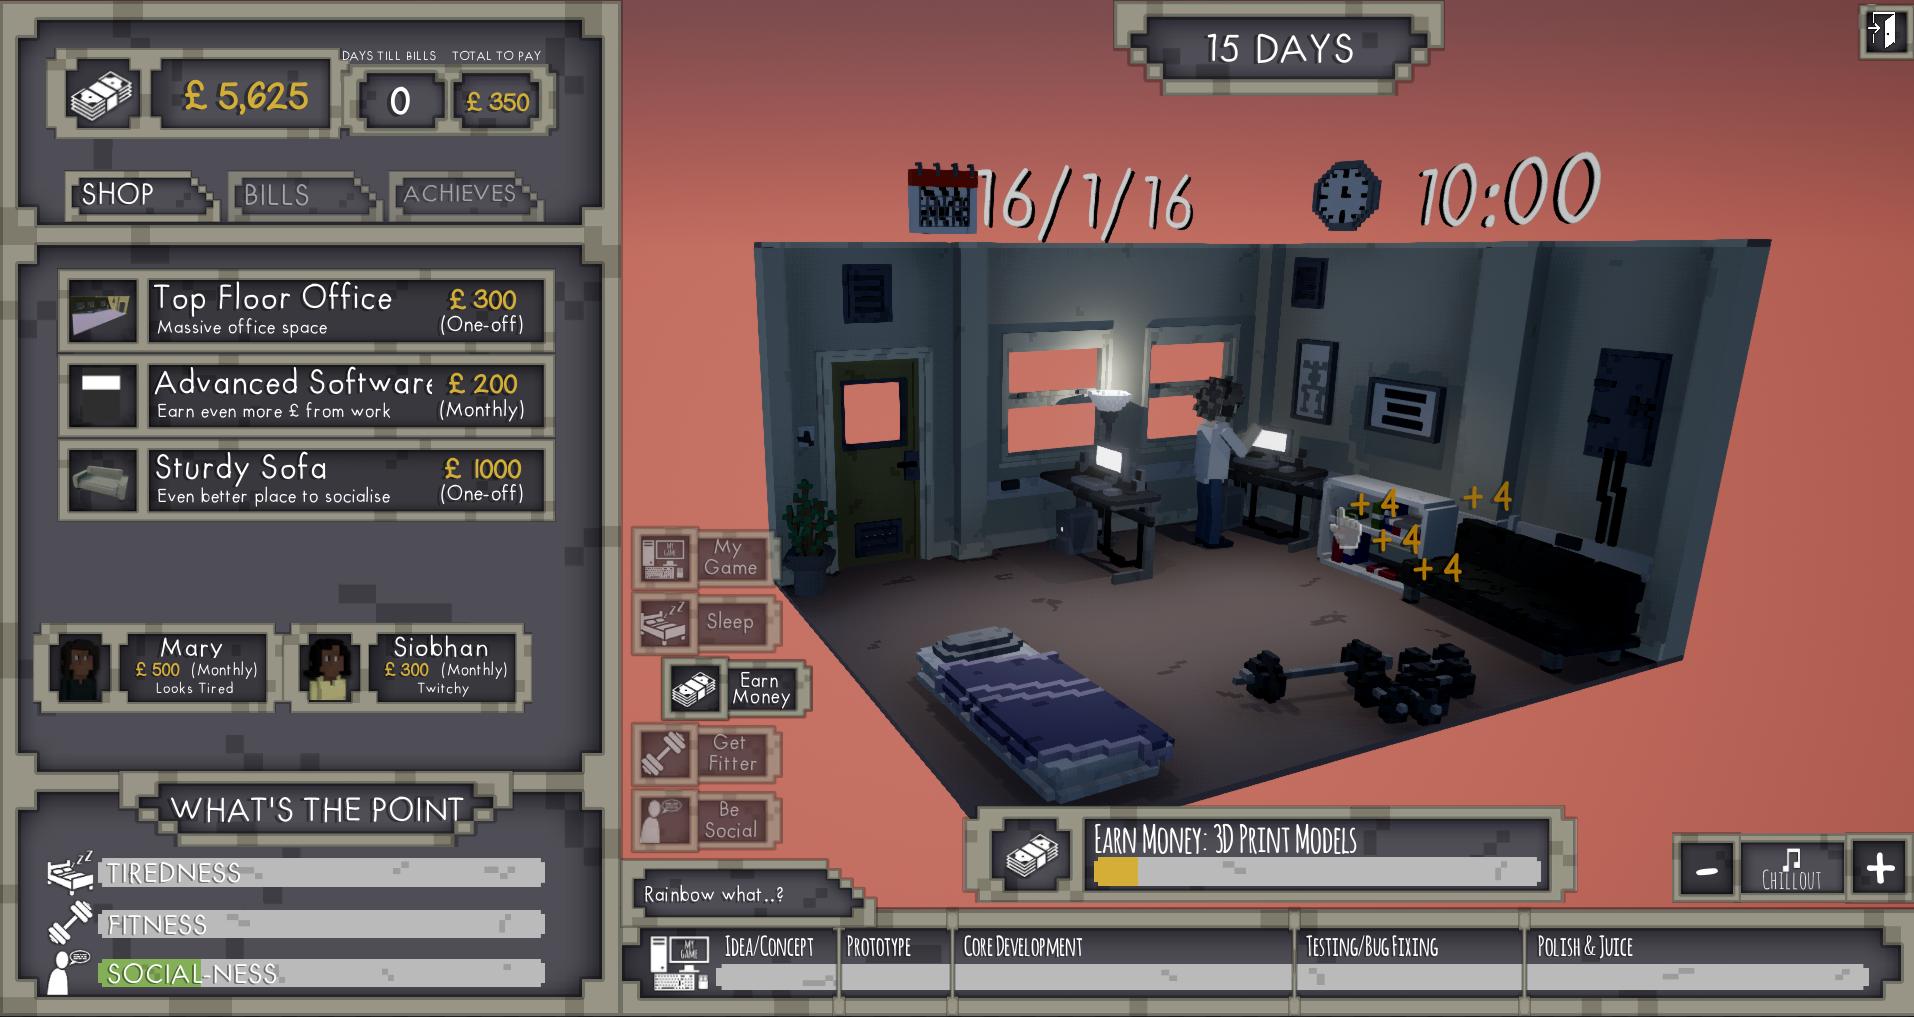 ids_screenshot04